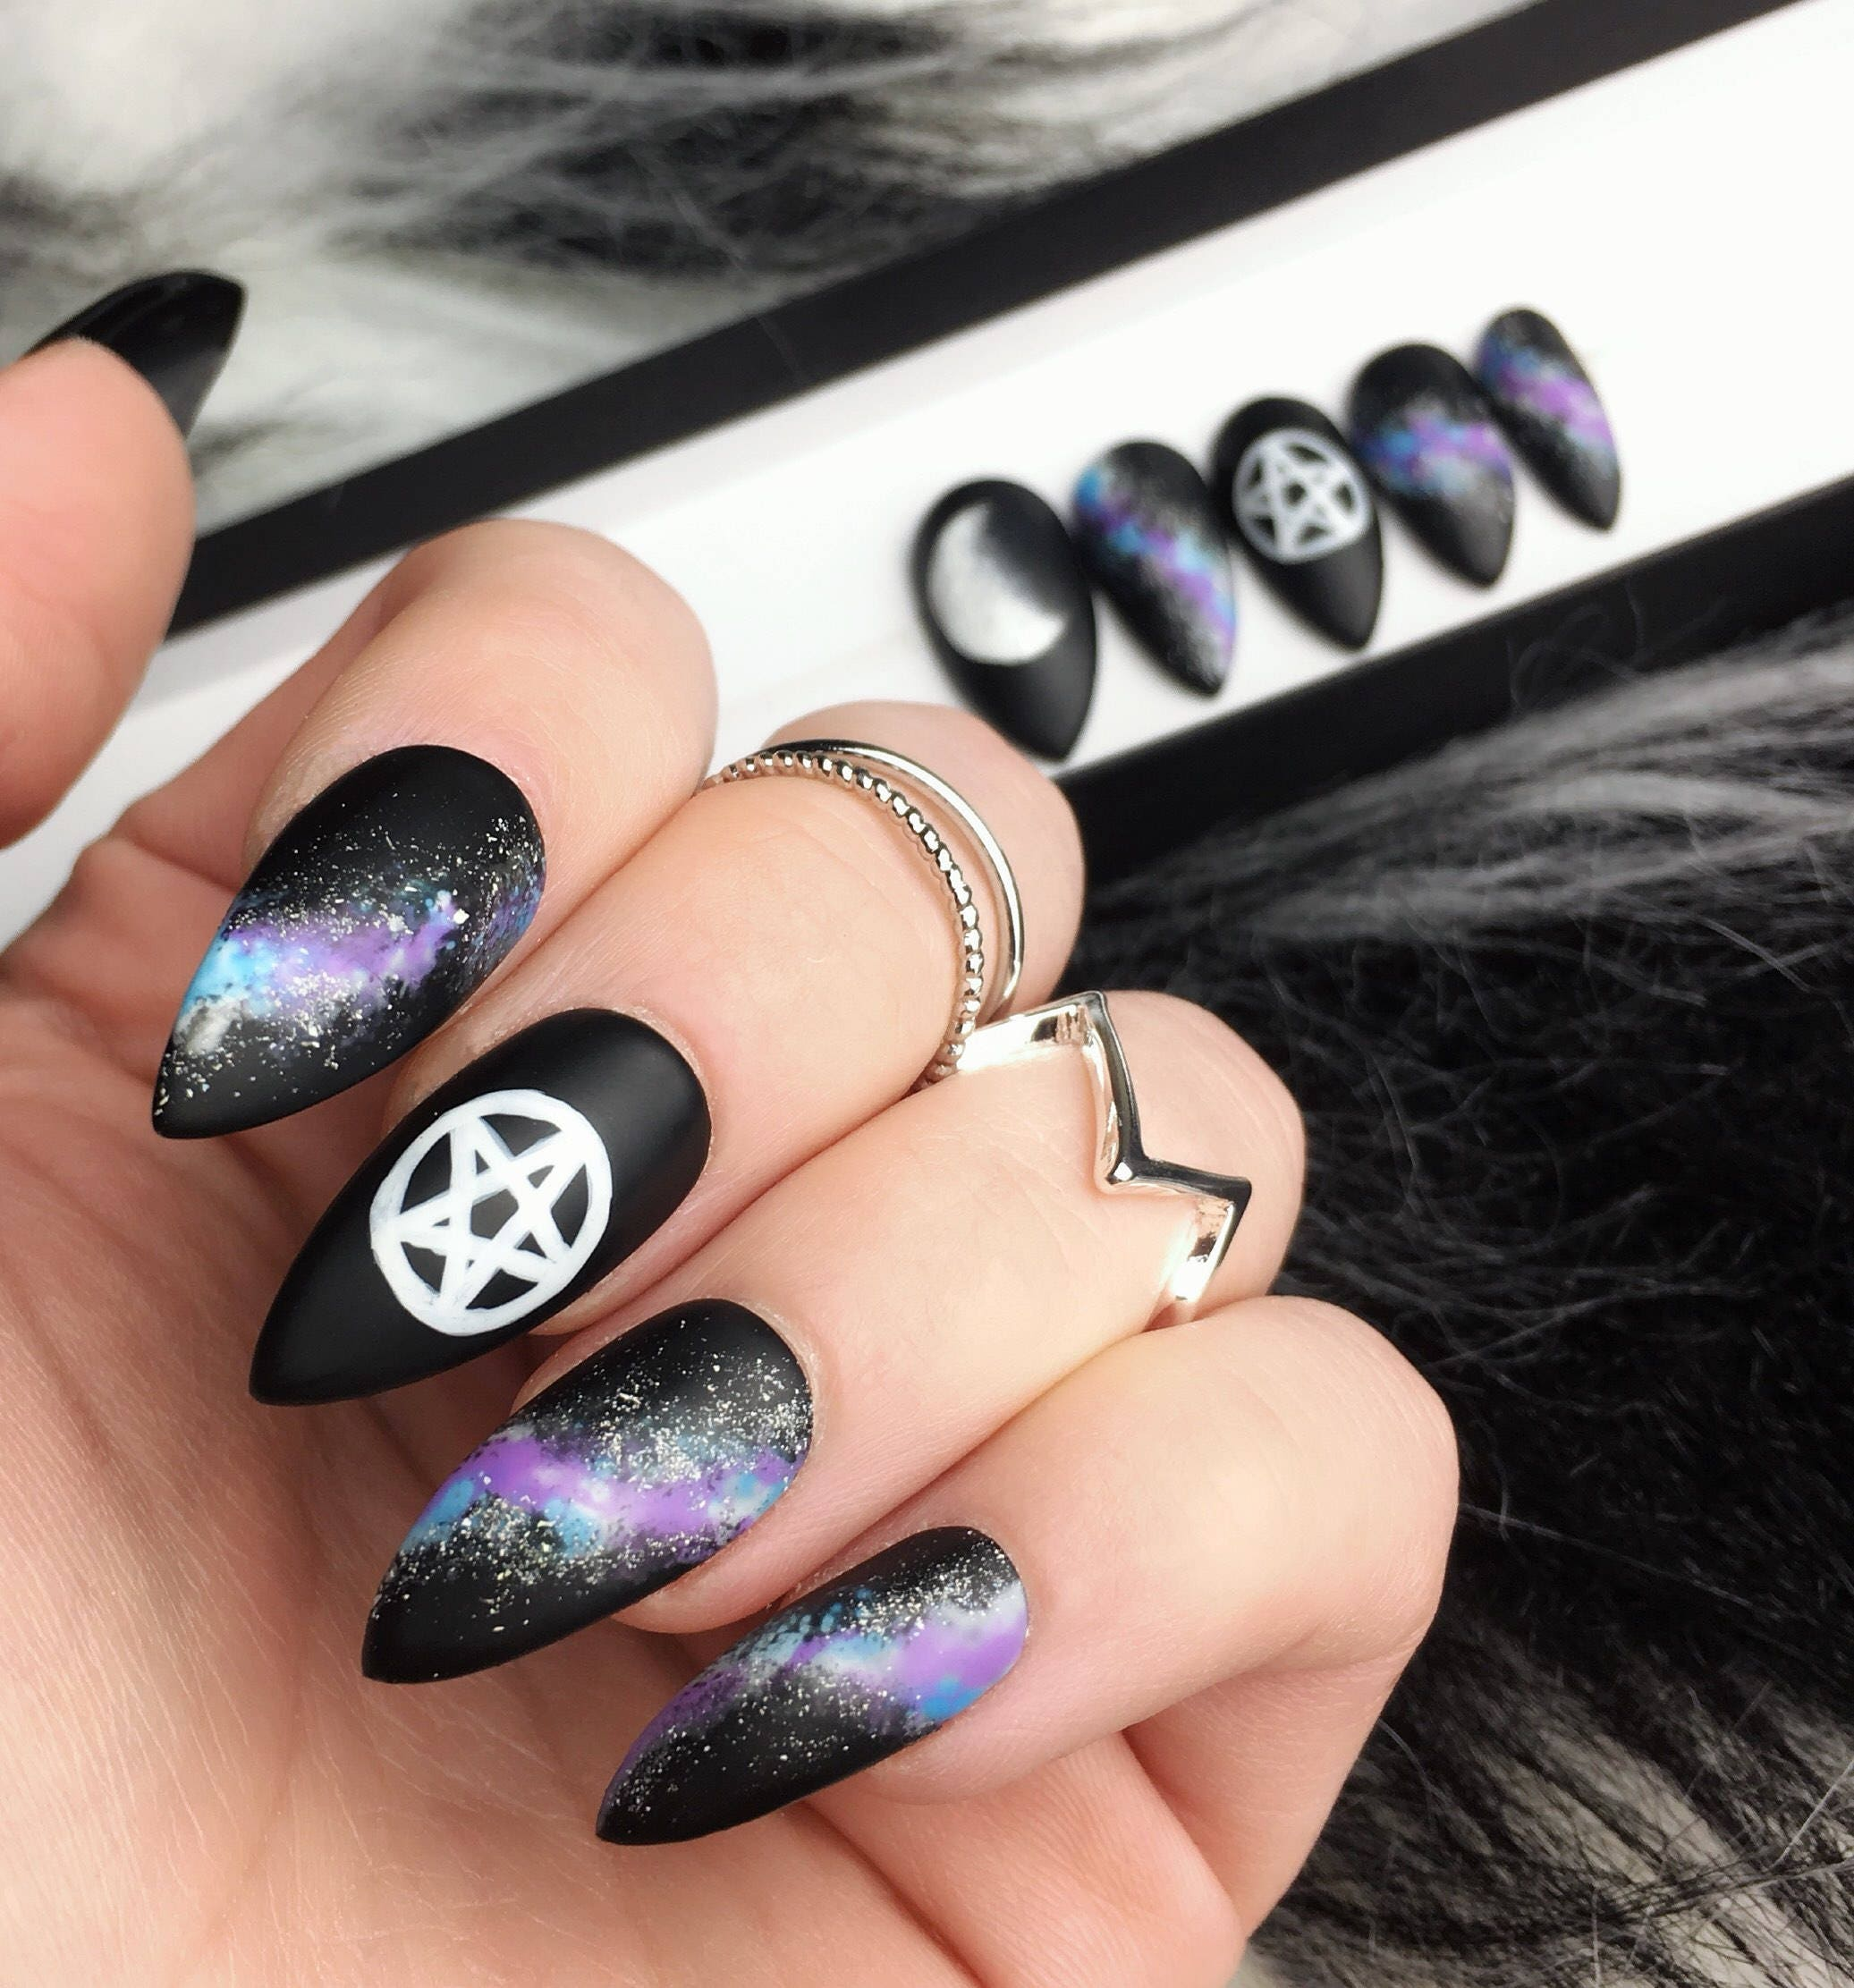 Matte Pentgram Press on Nails | Galaxy False Nails | Moon Phase ...